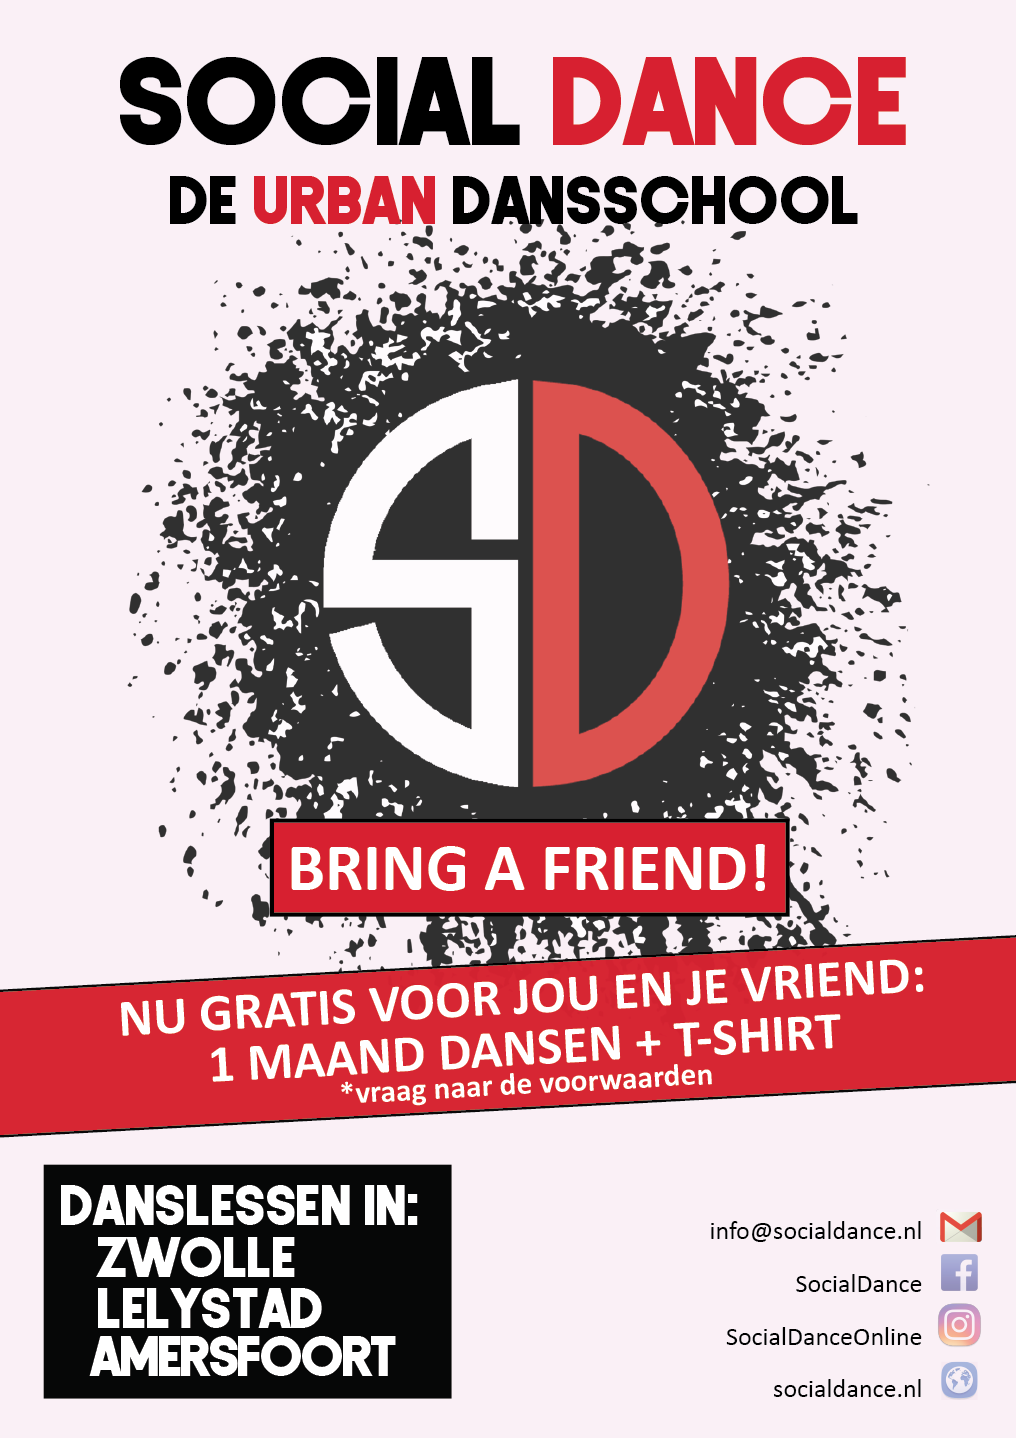 BRING_A_FRIEND_SocialDance_Nieuwe_Actie_Instaformat-01